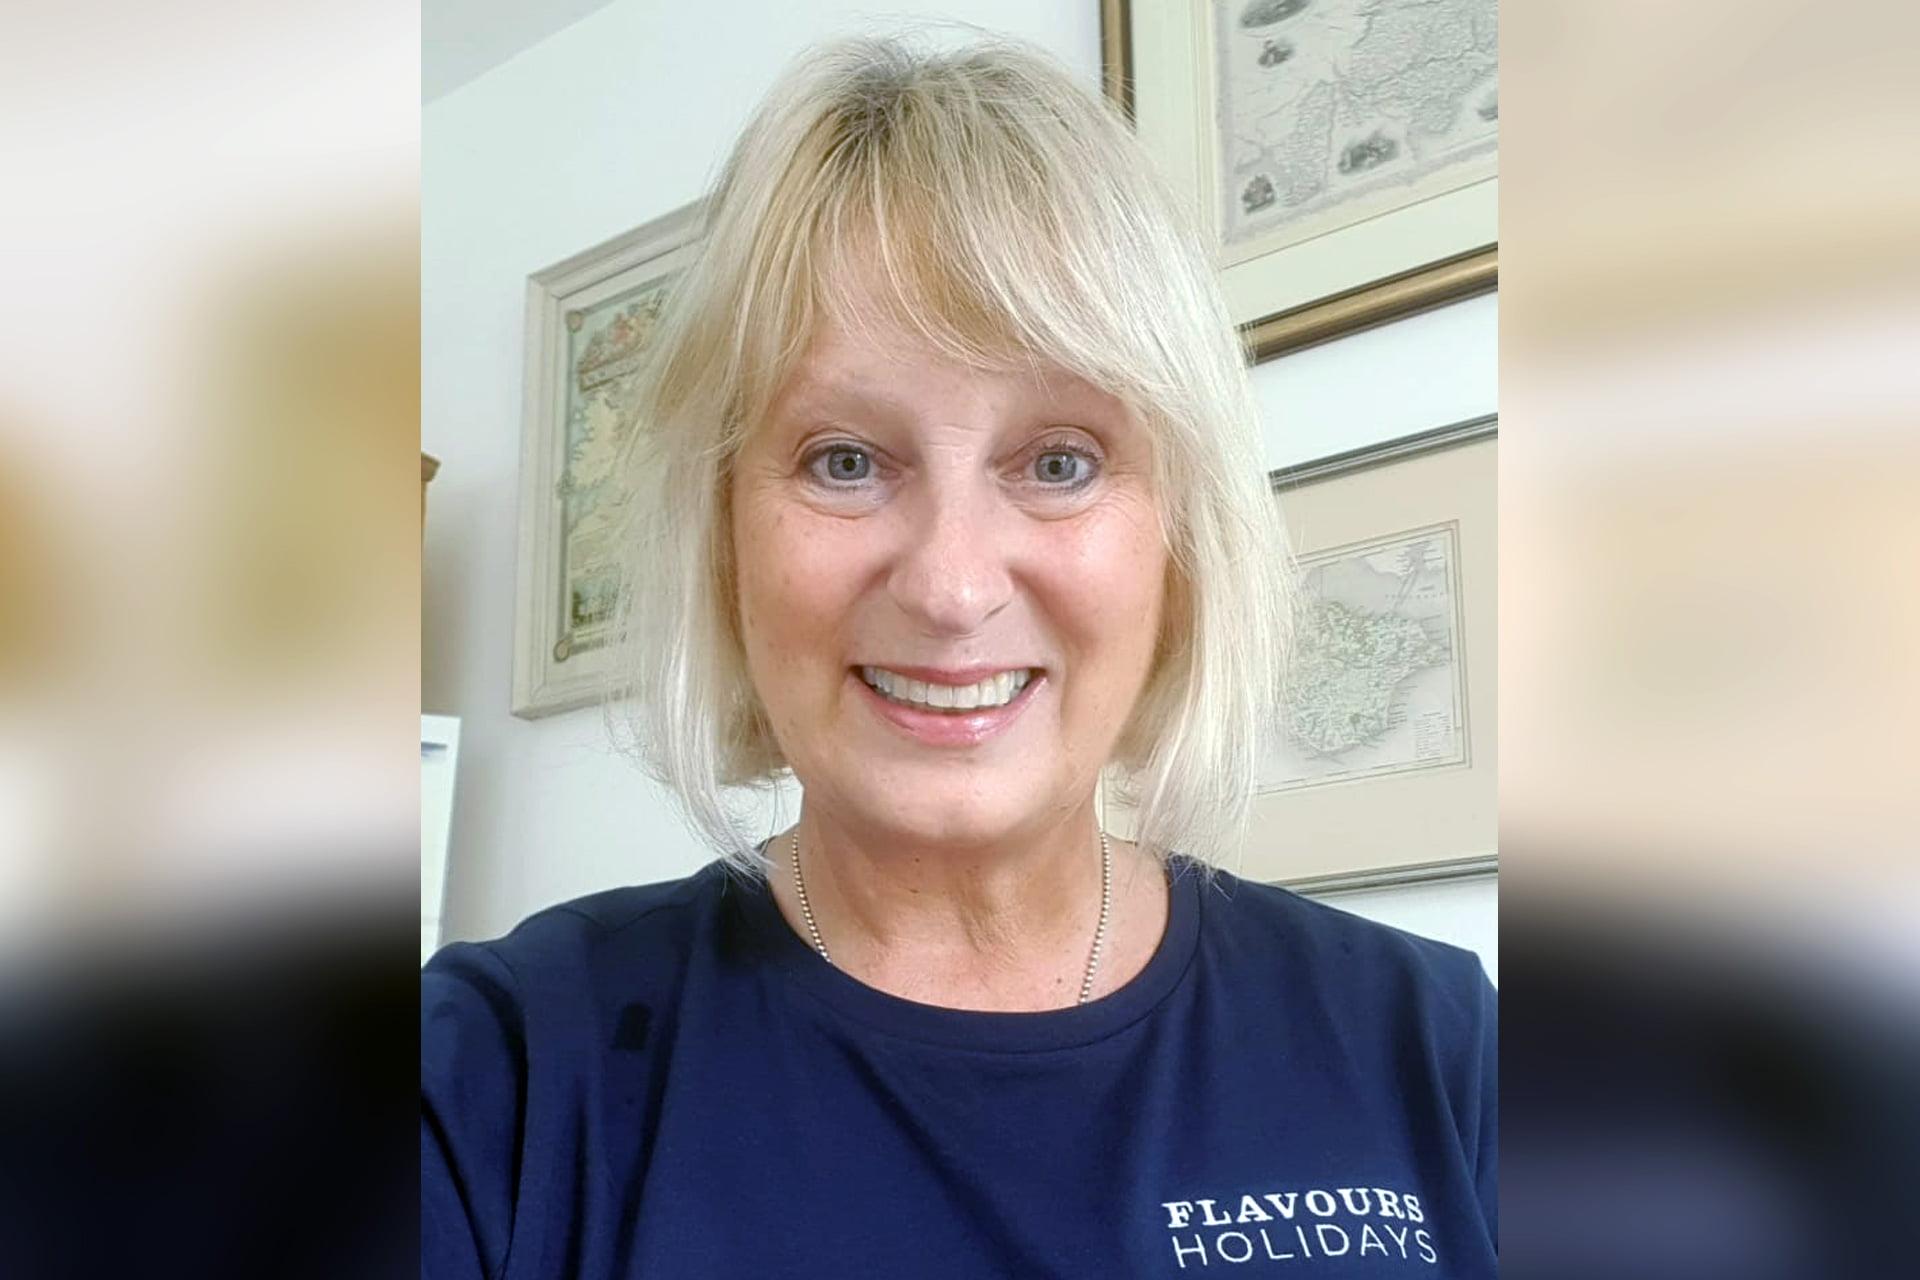 Headshot of Pilates tutor Mandy Parr.